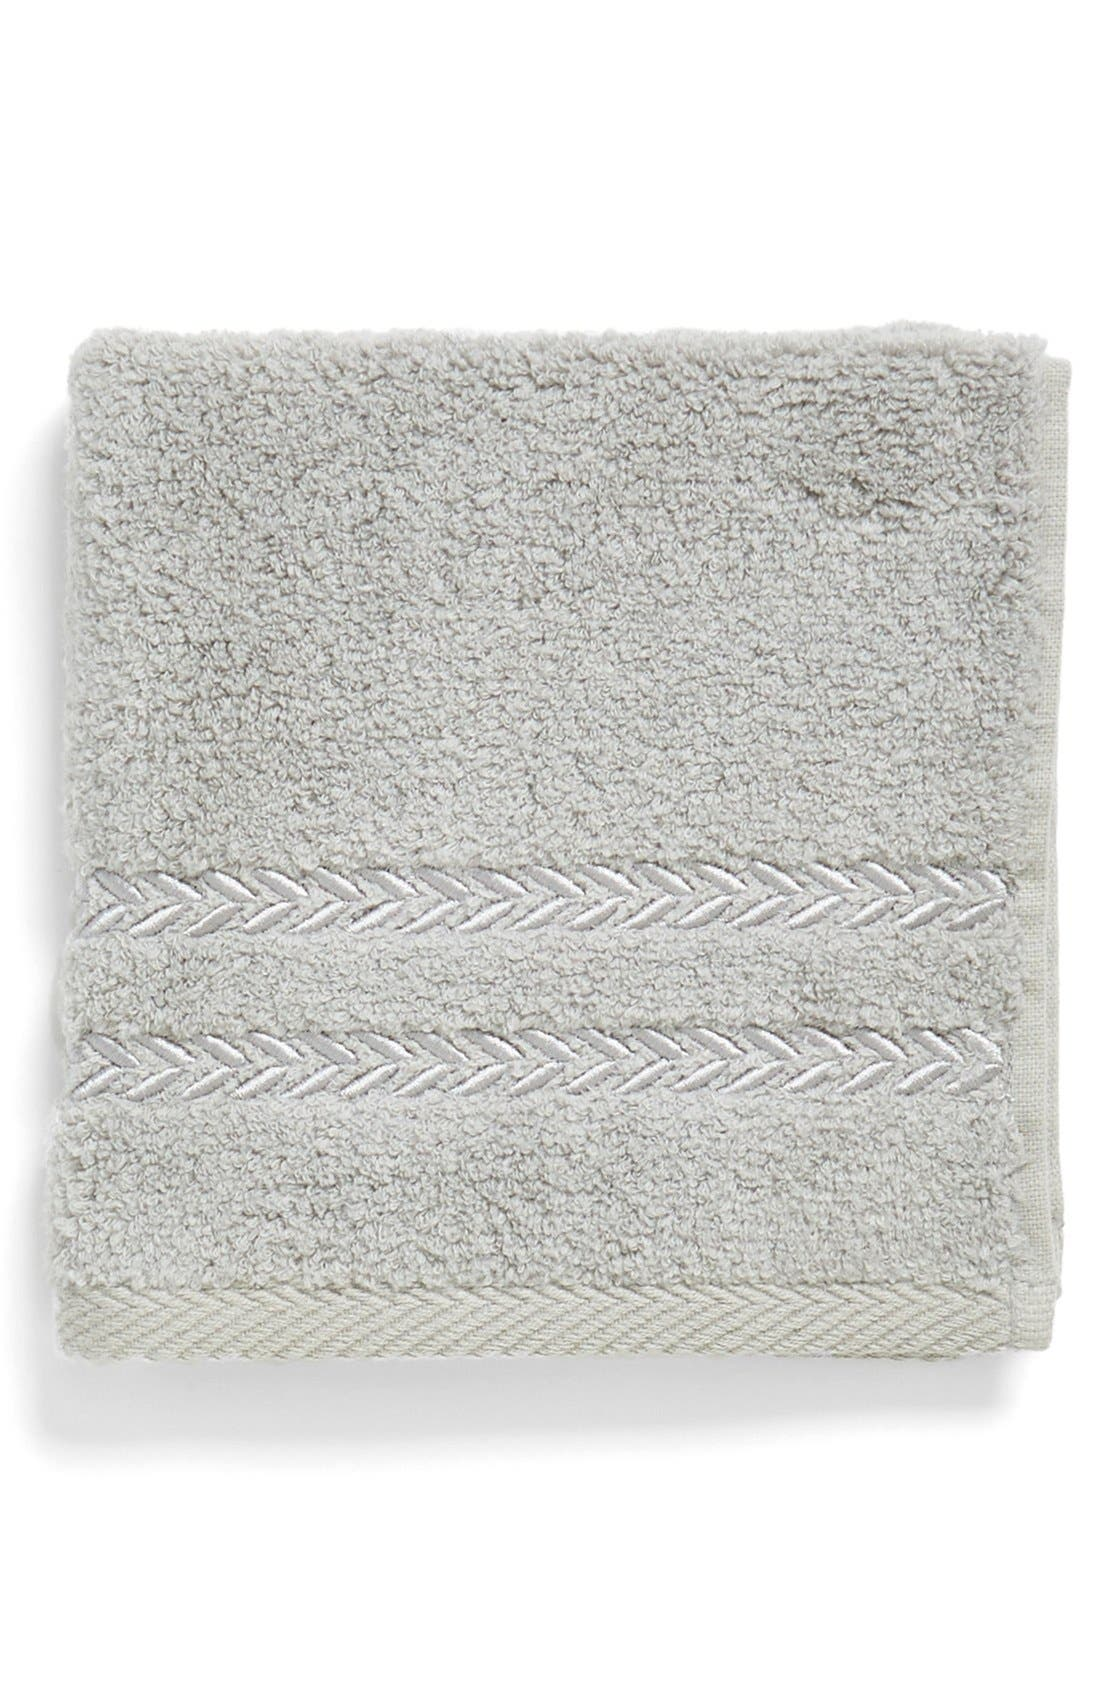 'Pearl Essence' Wash Towel,                             Main thumbnail 1, color,                             Smoke